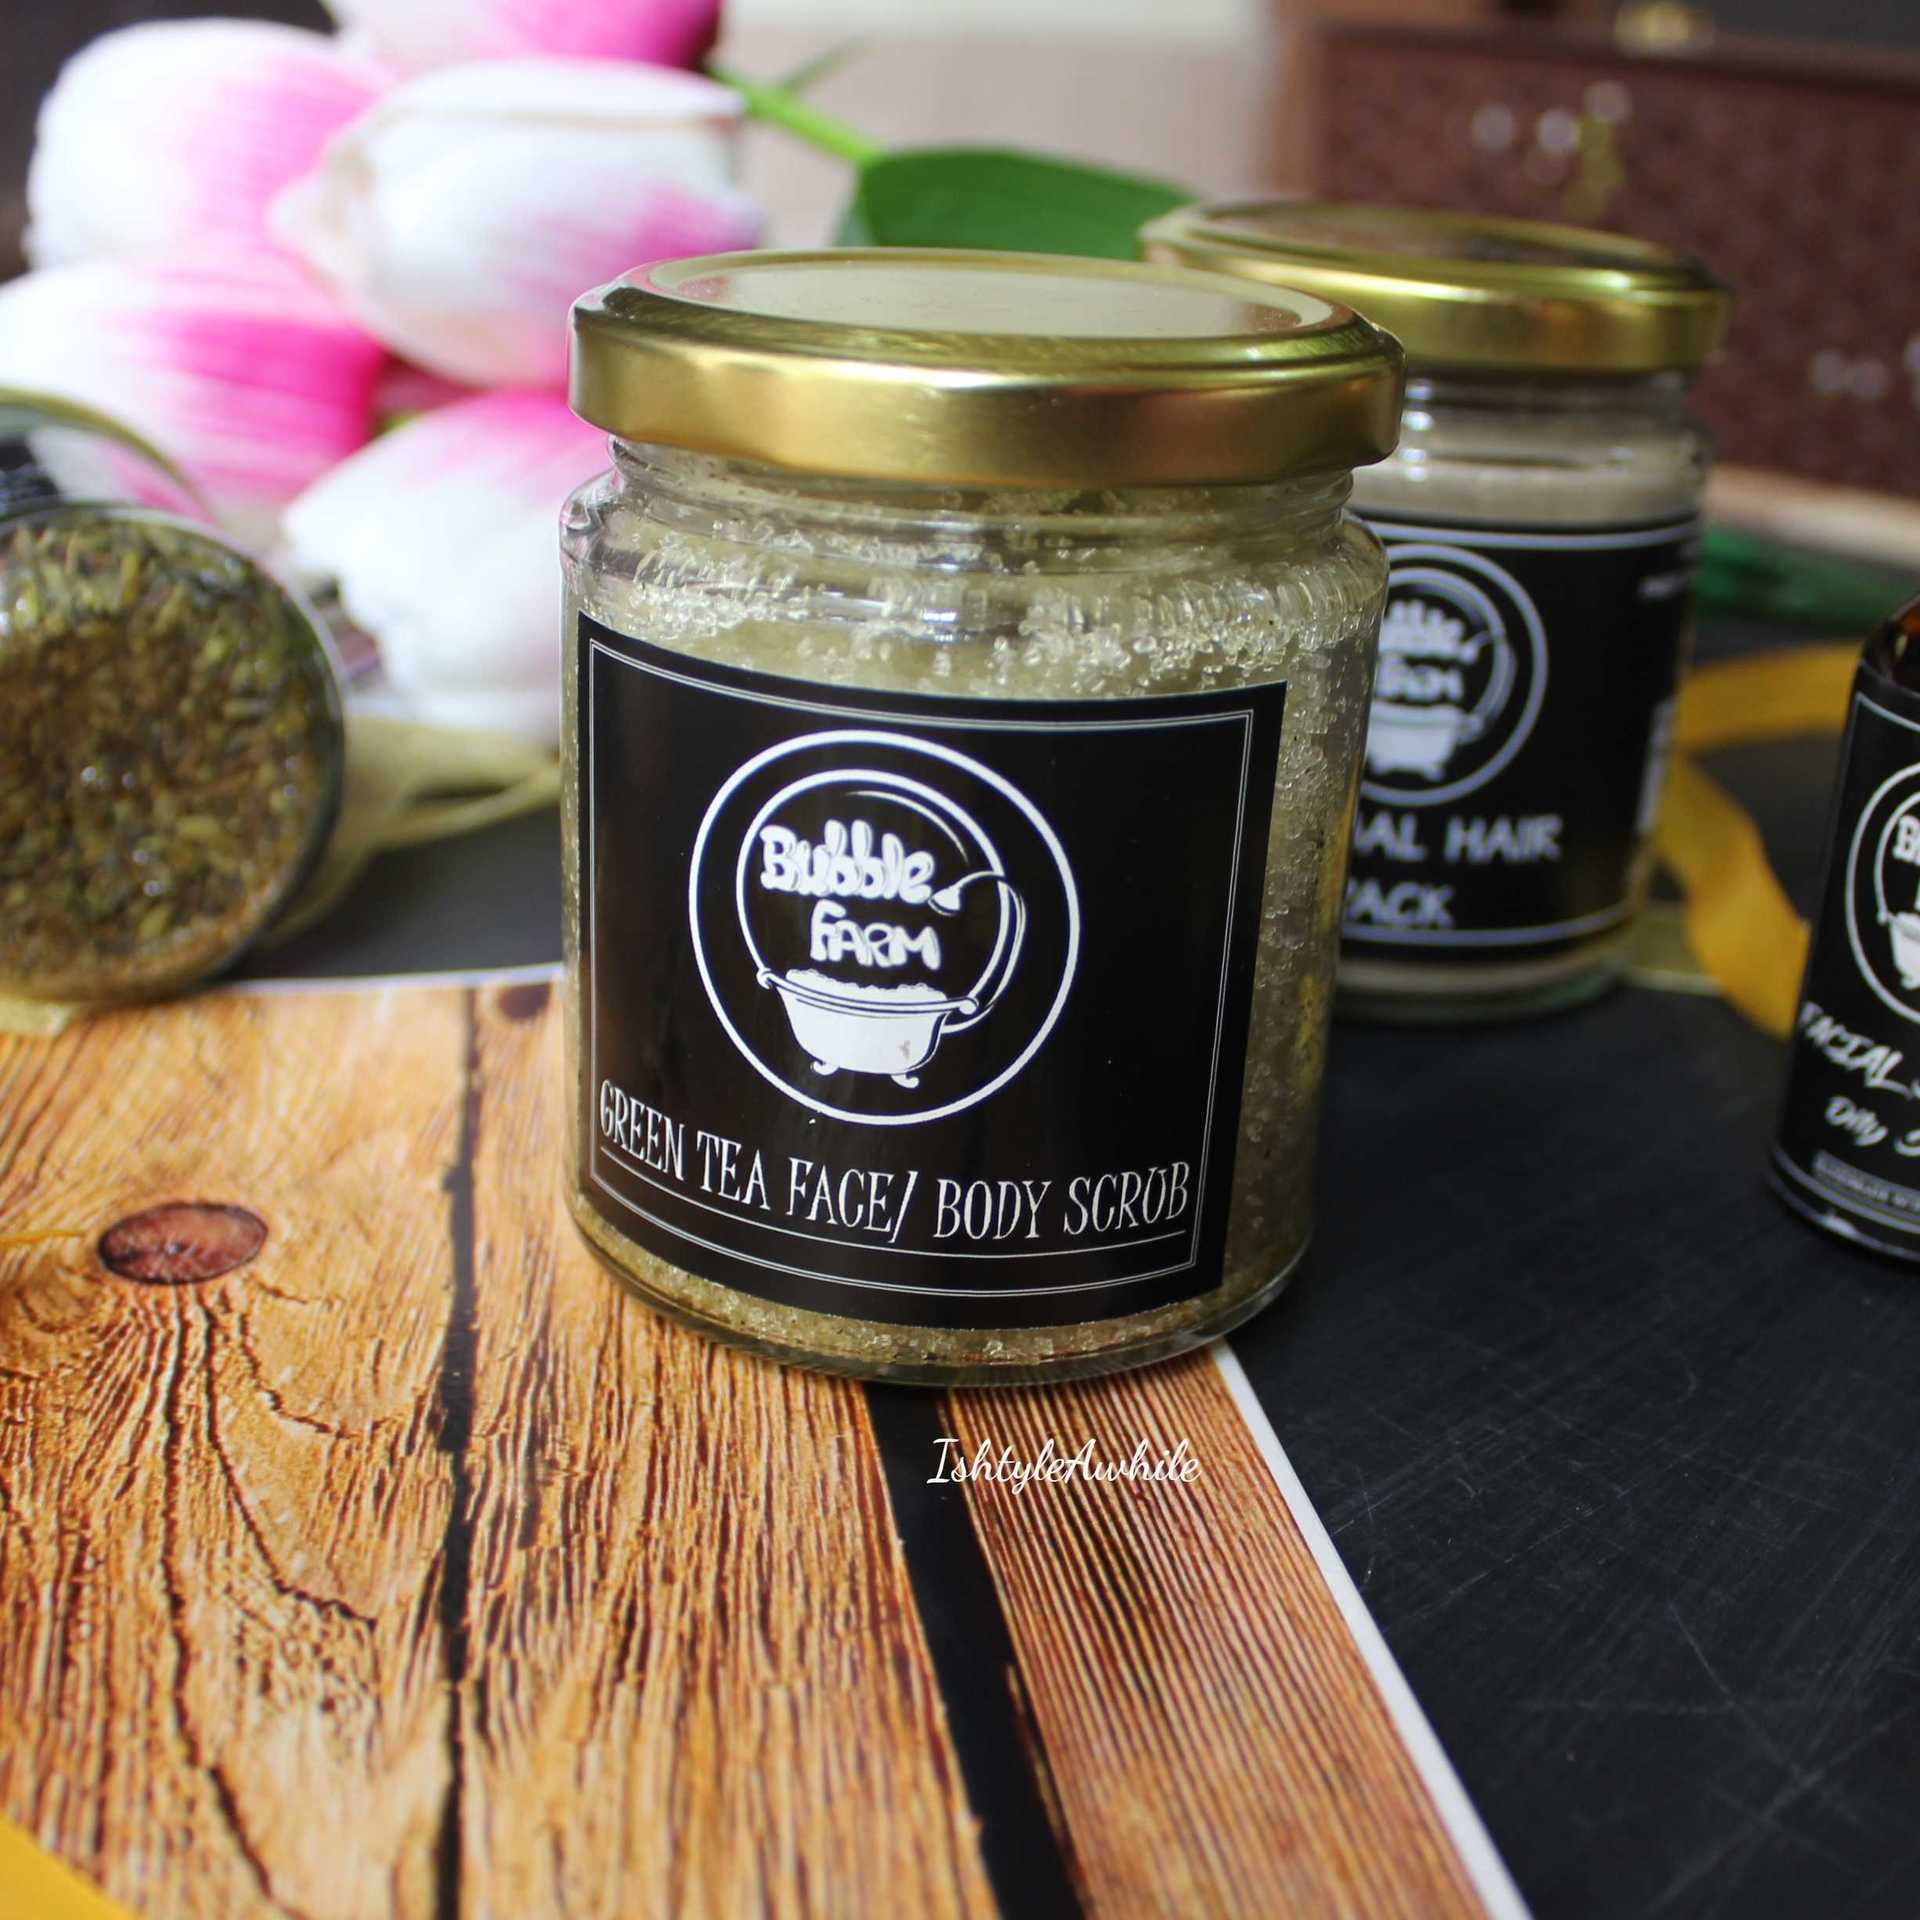 IshtyleAwhile - A Chennai based Indian Fashion Blog - Green tea face and body scrub bubble farm